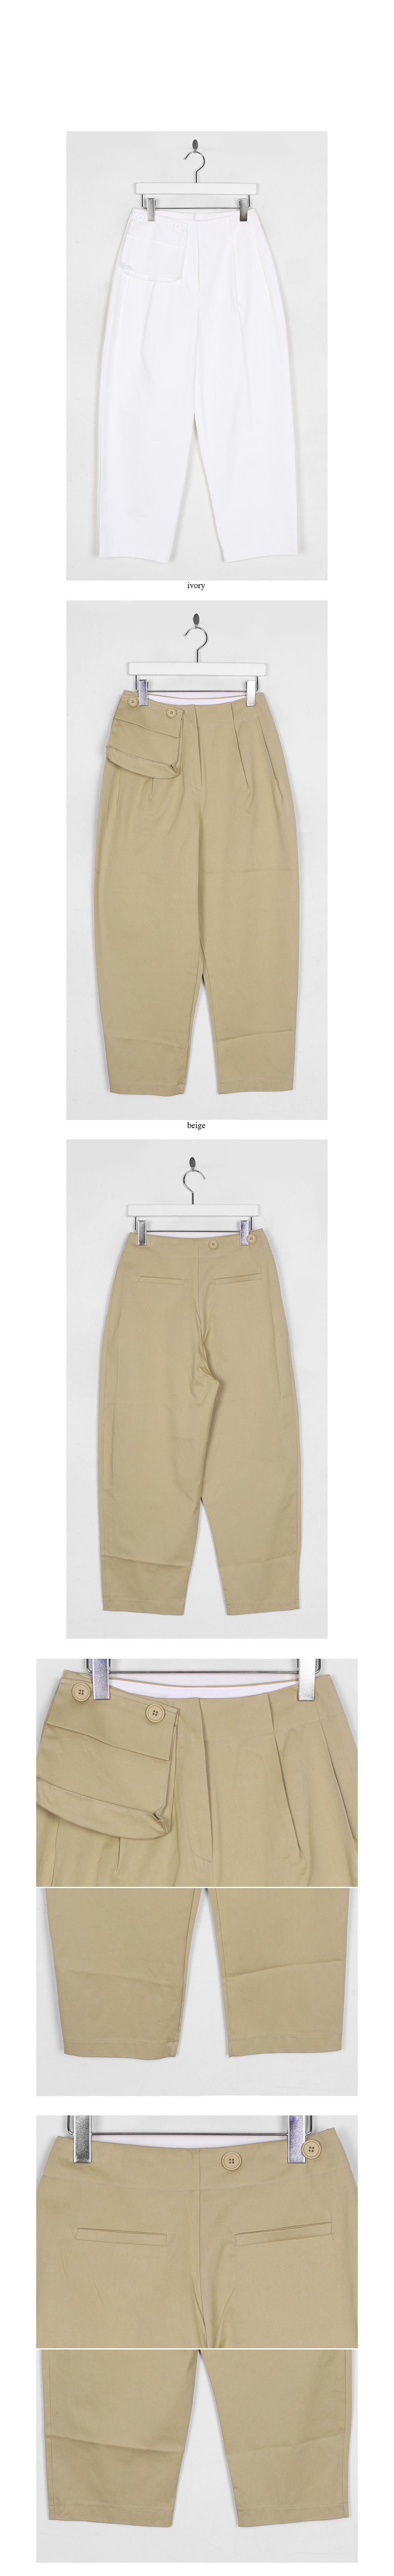 light cotton pocket pants